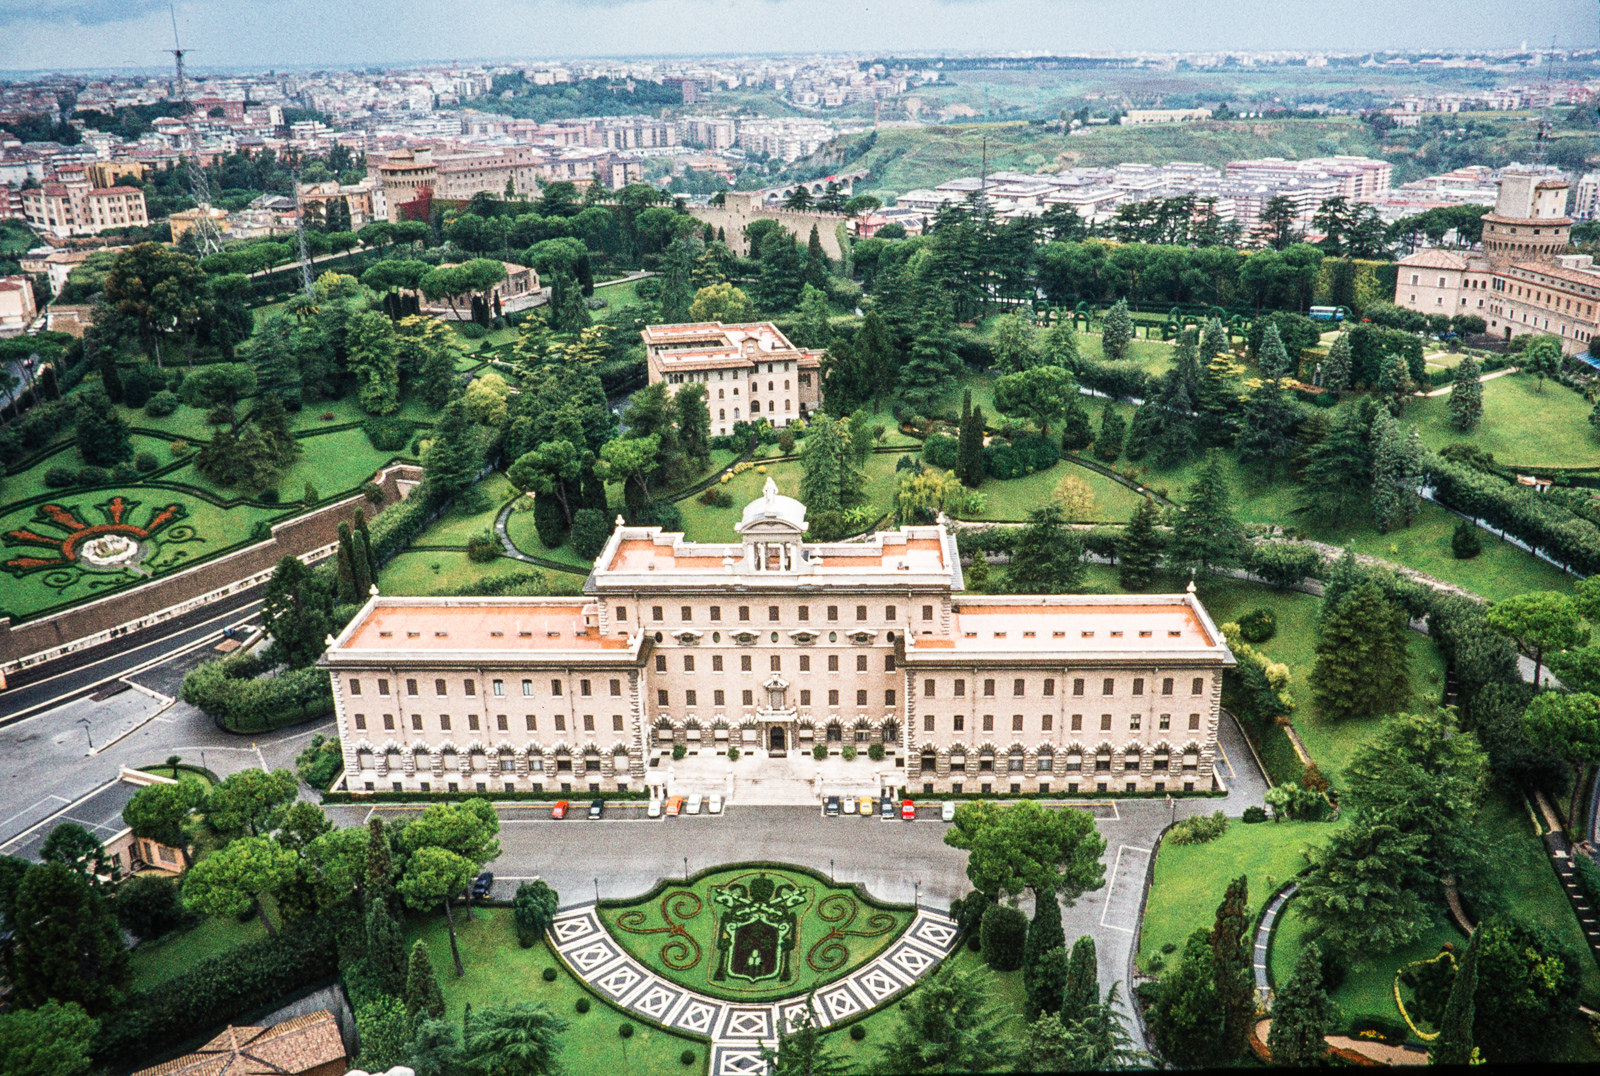 Сады Ватикана на Ватиканском холме